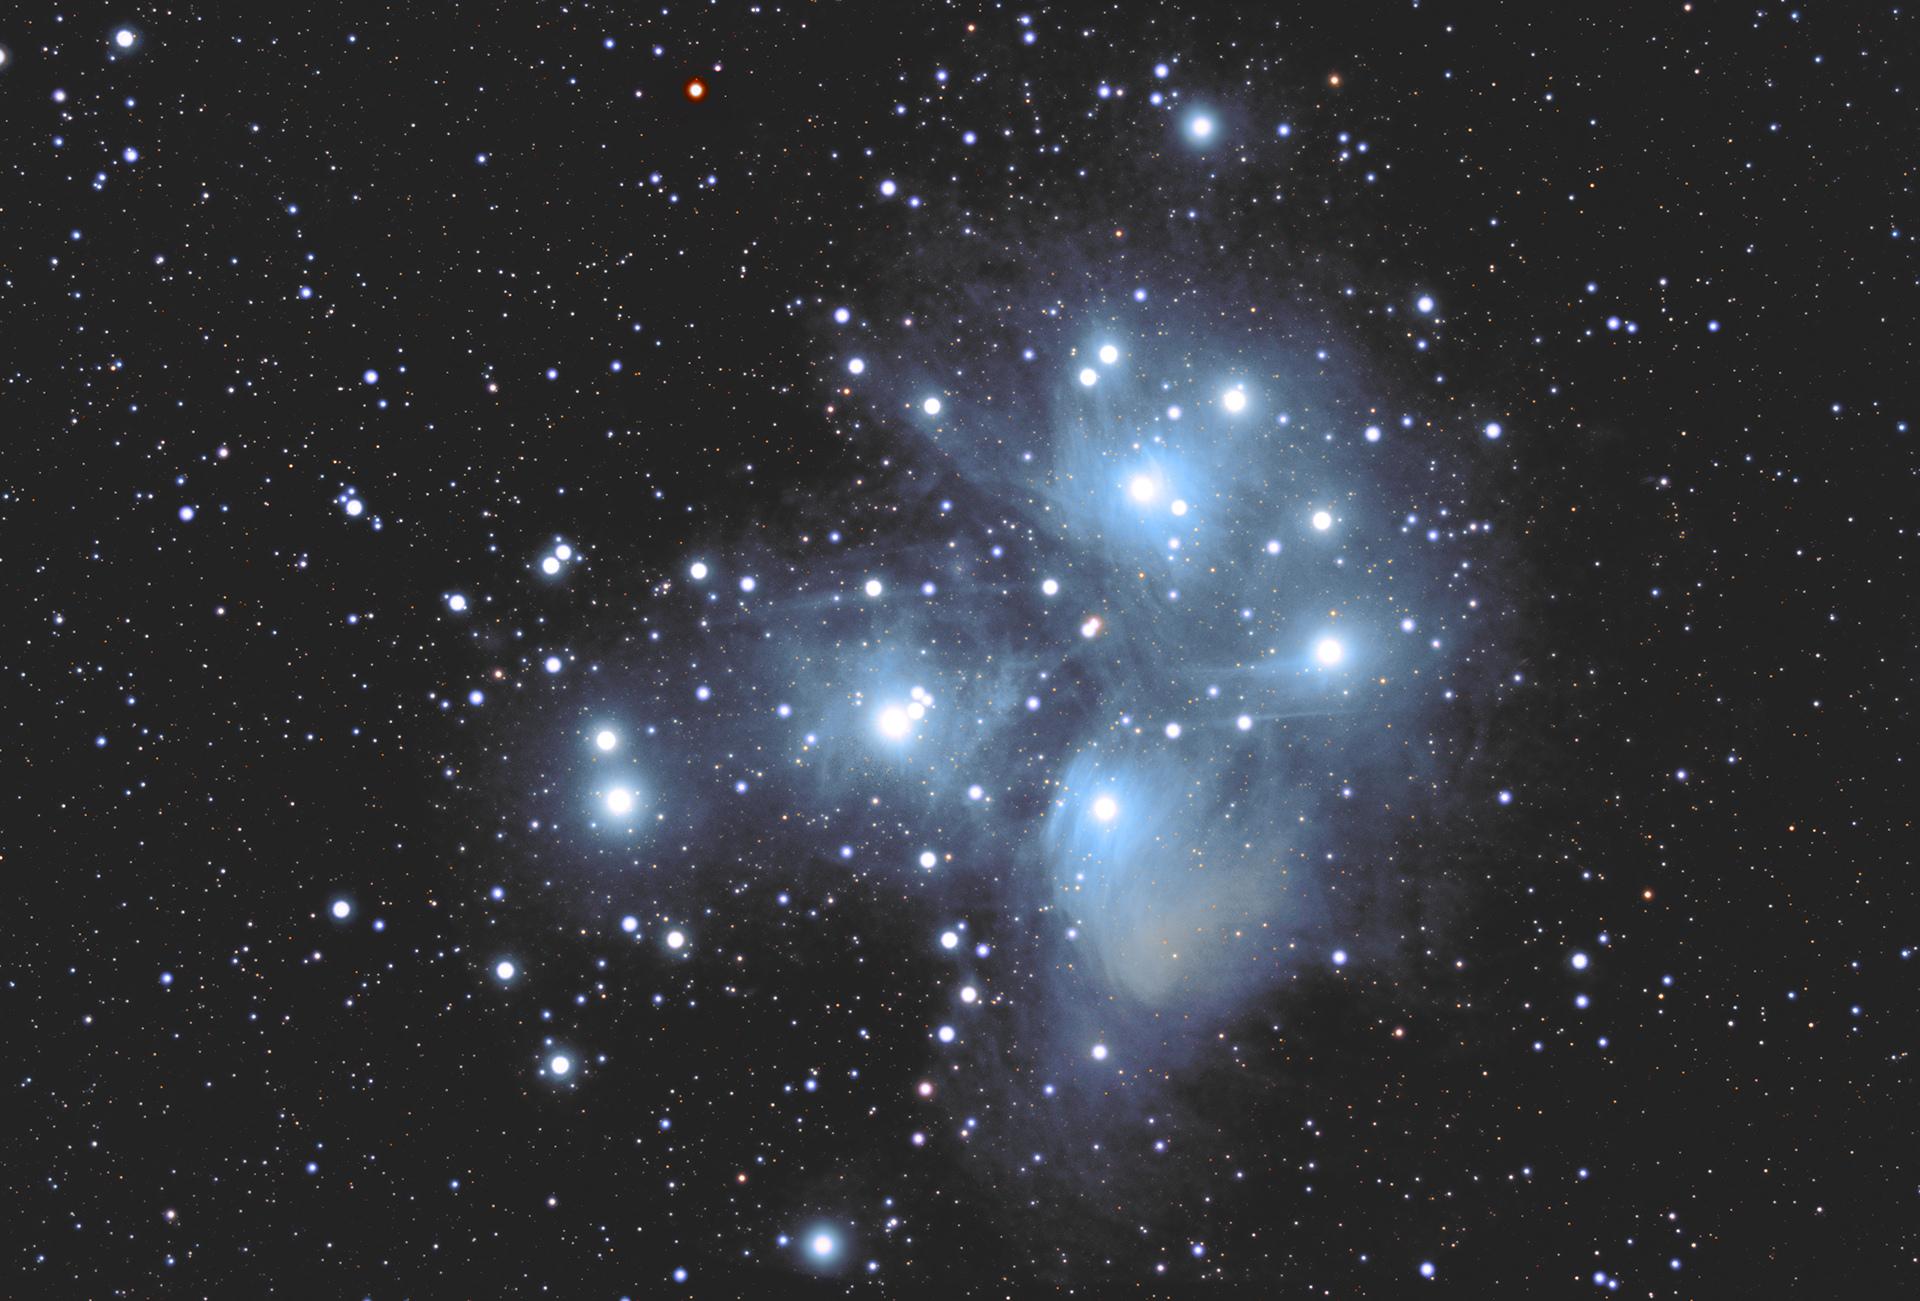 5e14352795dee_M4529-12-2019V4.jpg.517029e8fc3bb8185a15a00ba36600b9.jpg